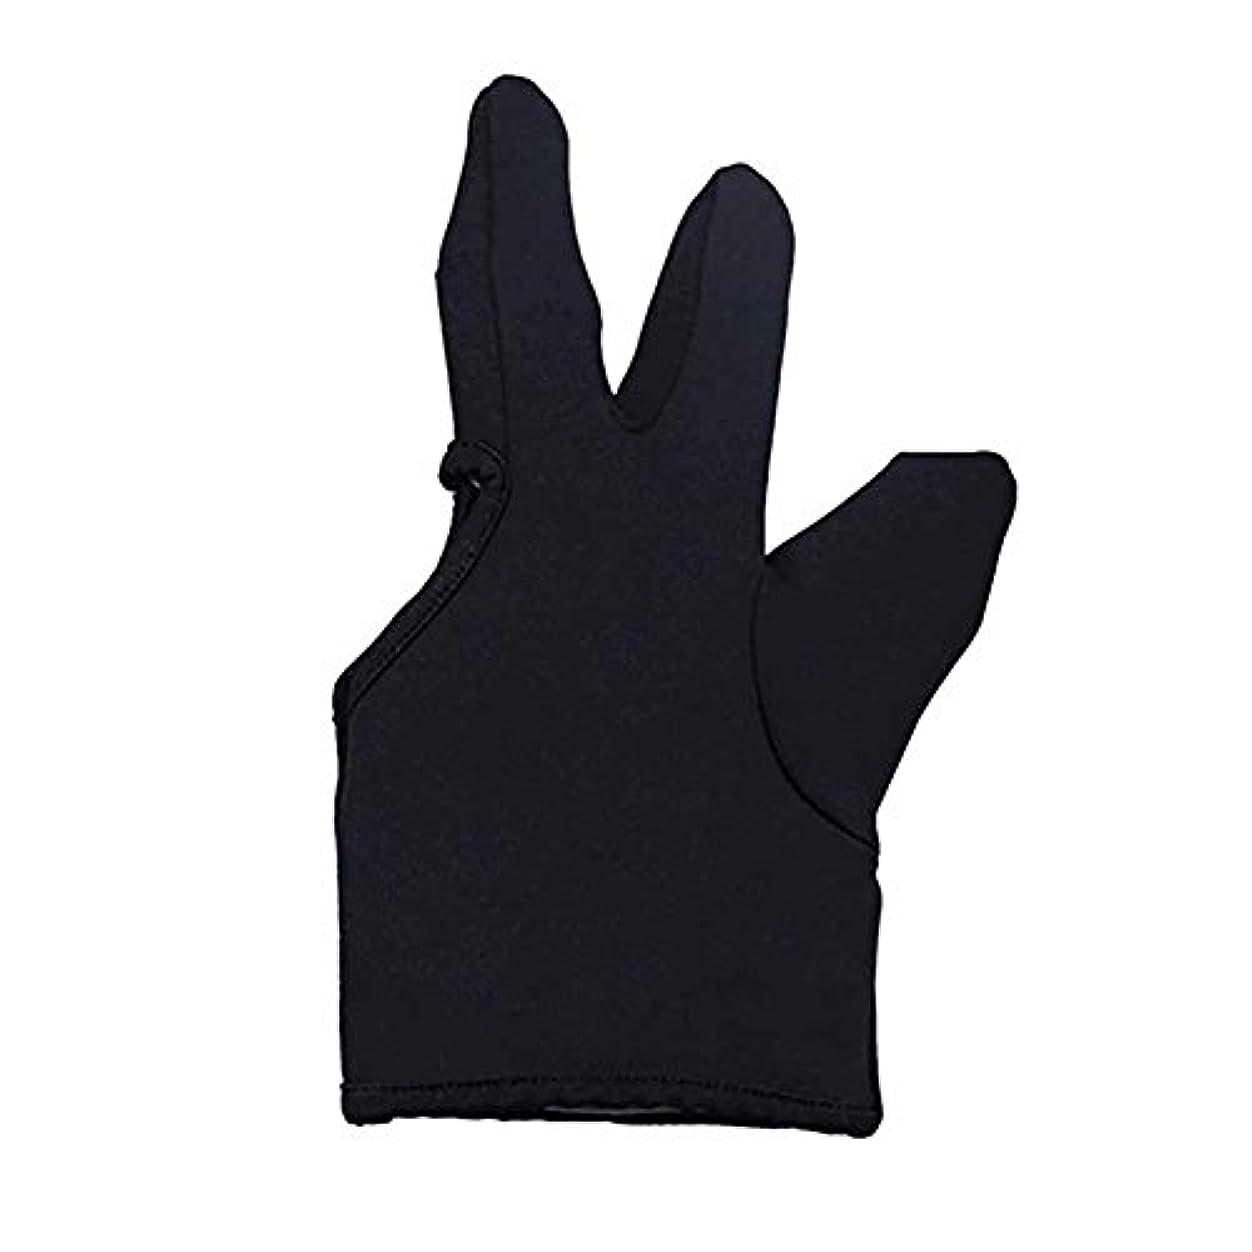 Liebeye 3本の指耐熱フィンガー保護手袋 ヘアスタイリングツール